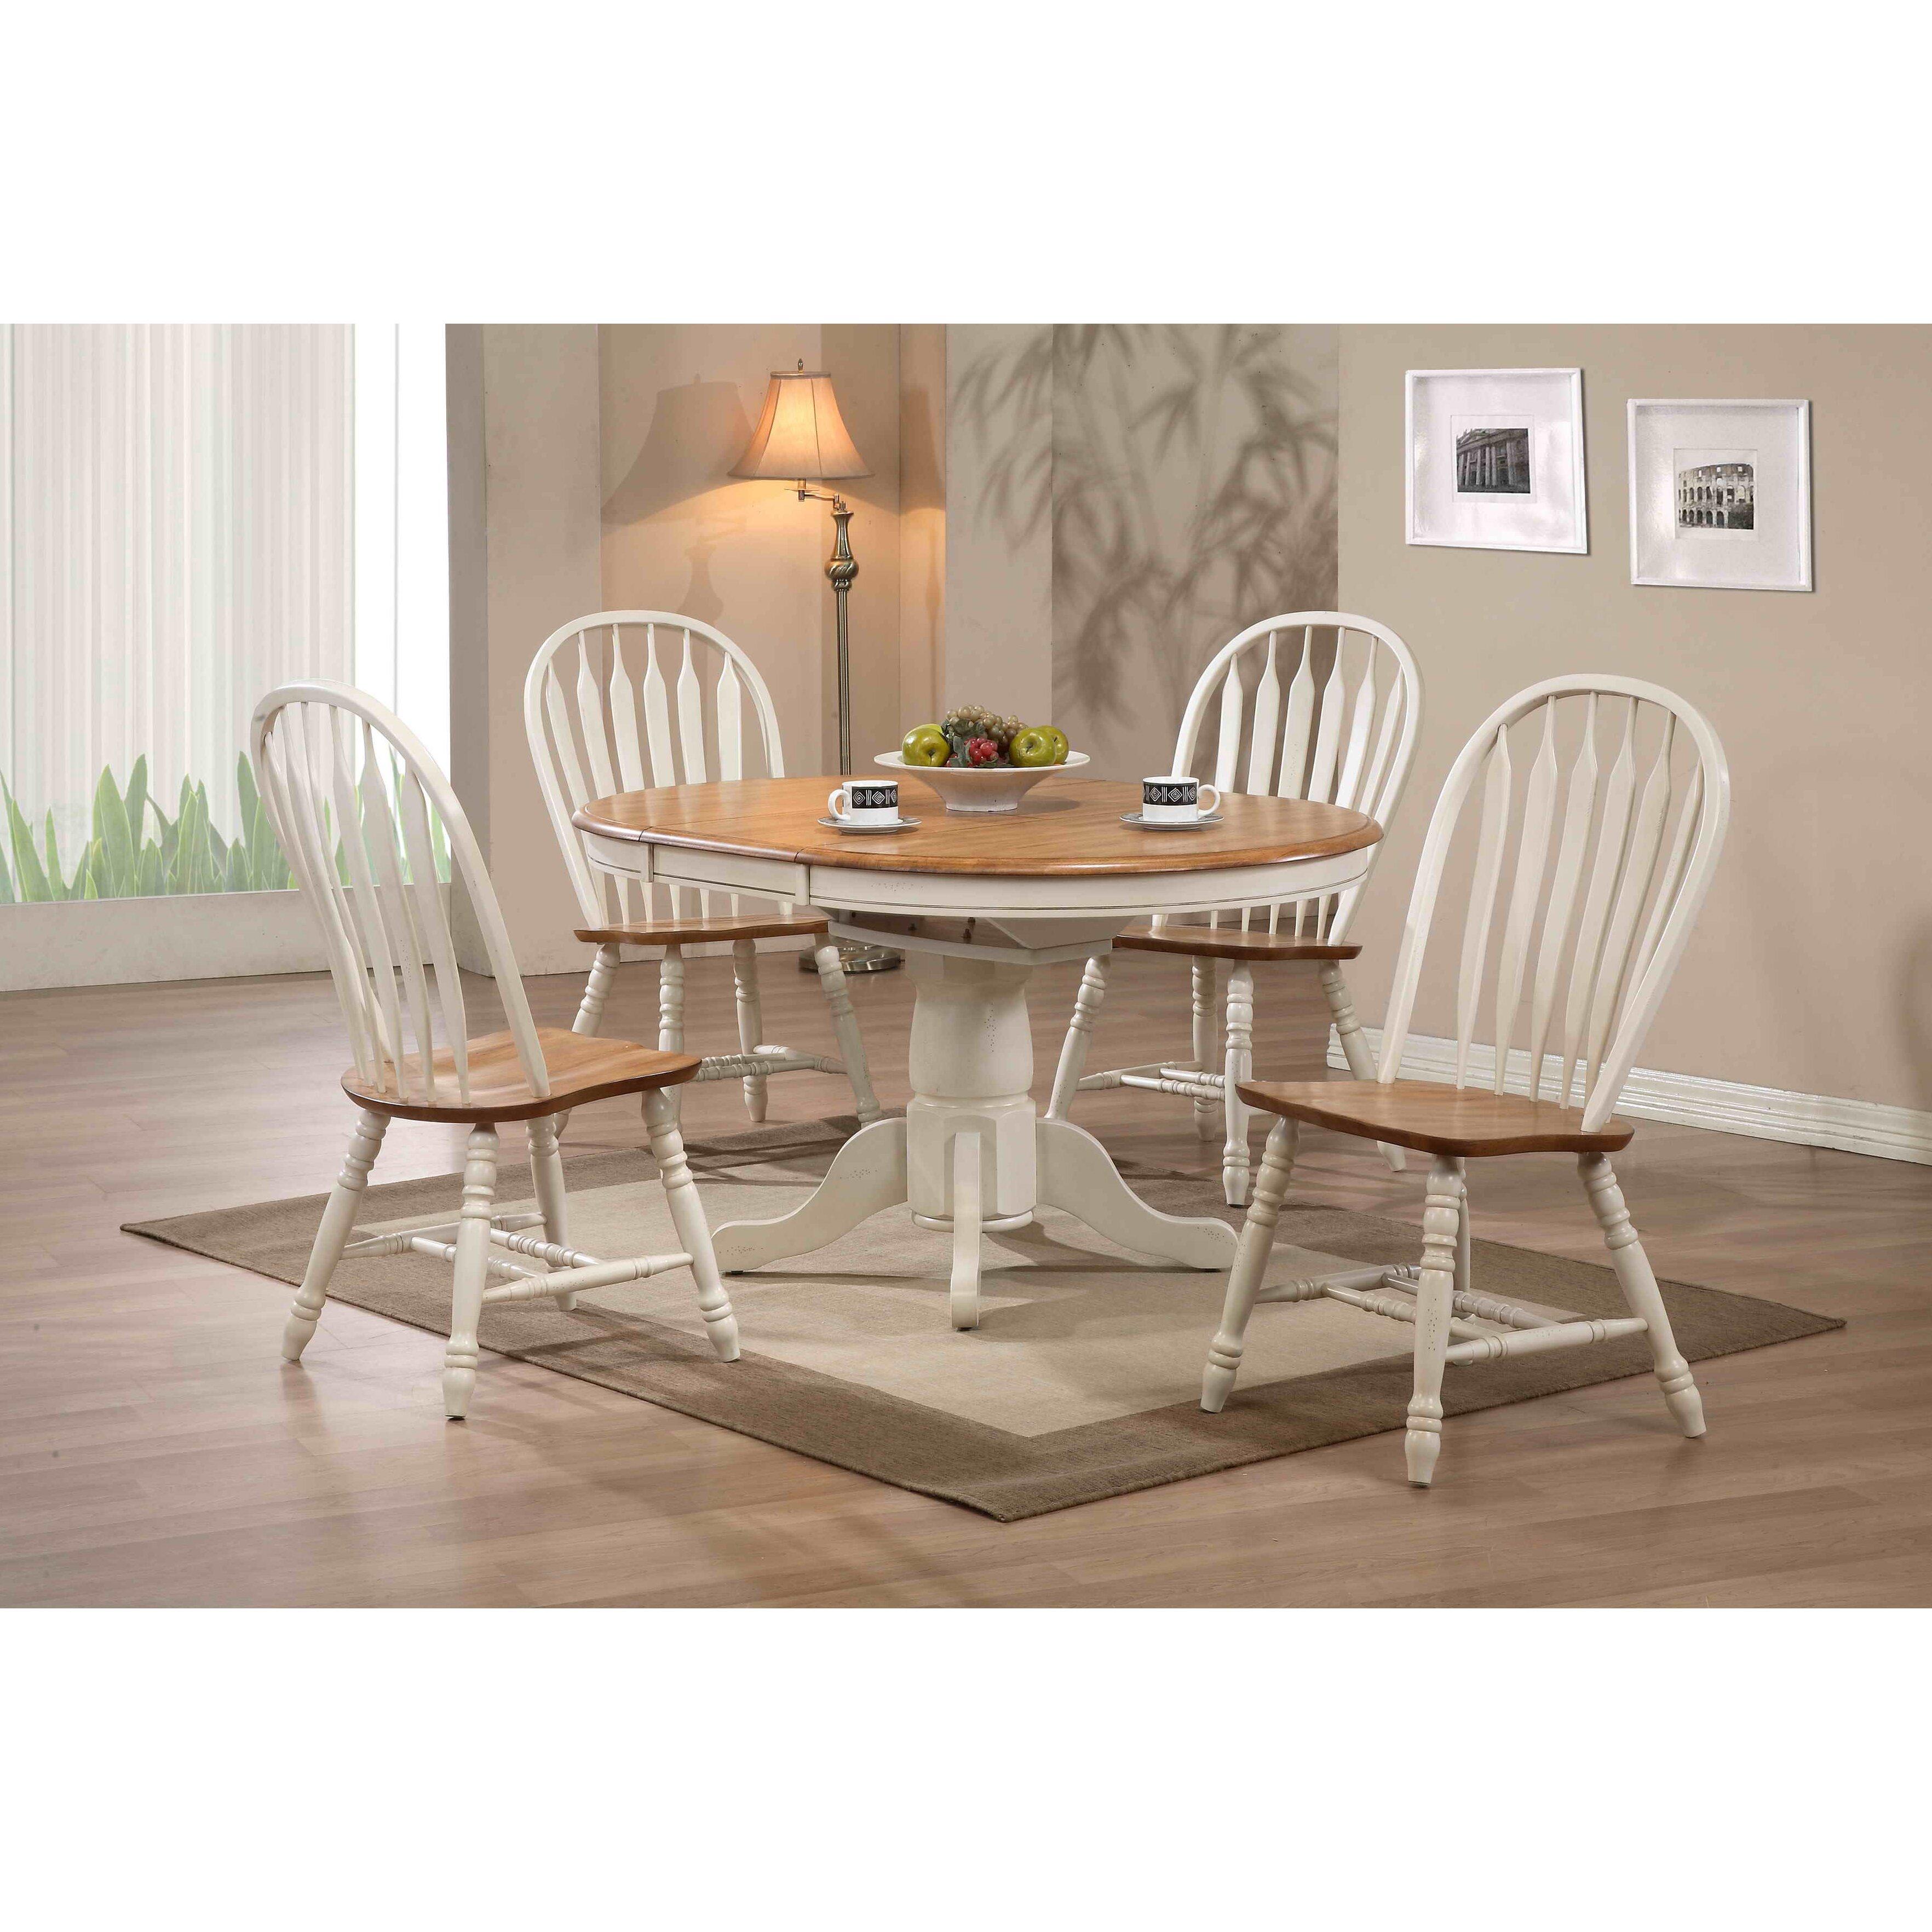 Expandable Kitchen Table Expandable Kitchen Dining Tables Youll Love Wayfair